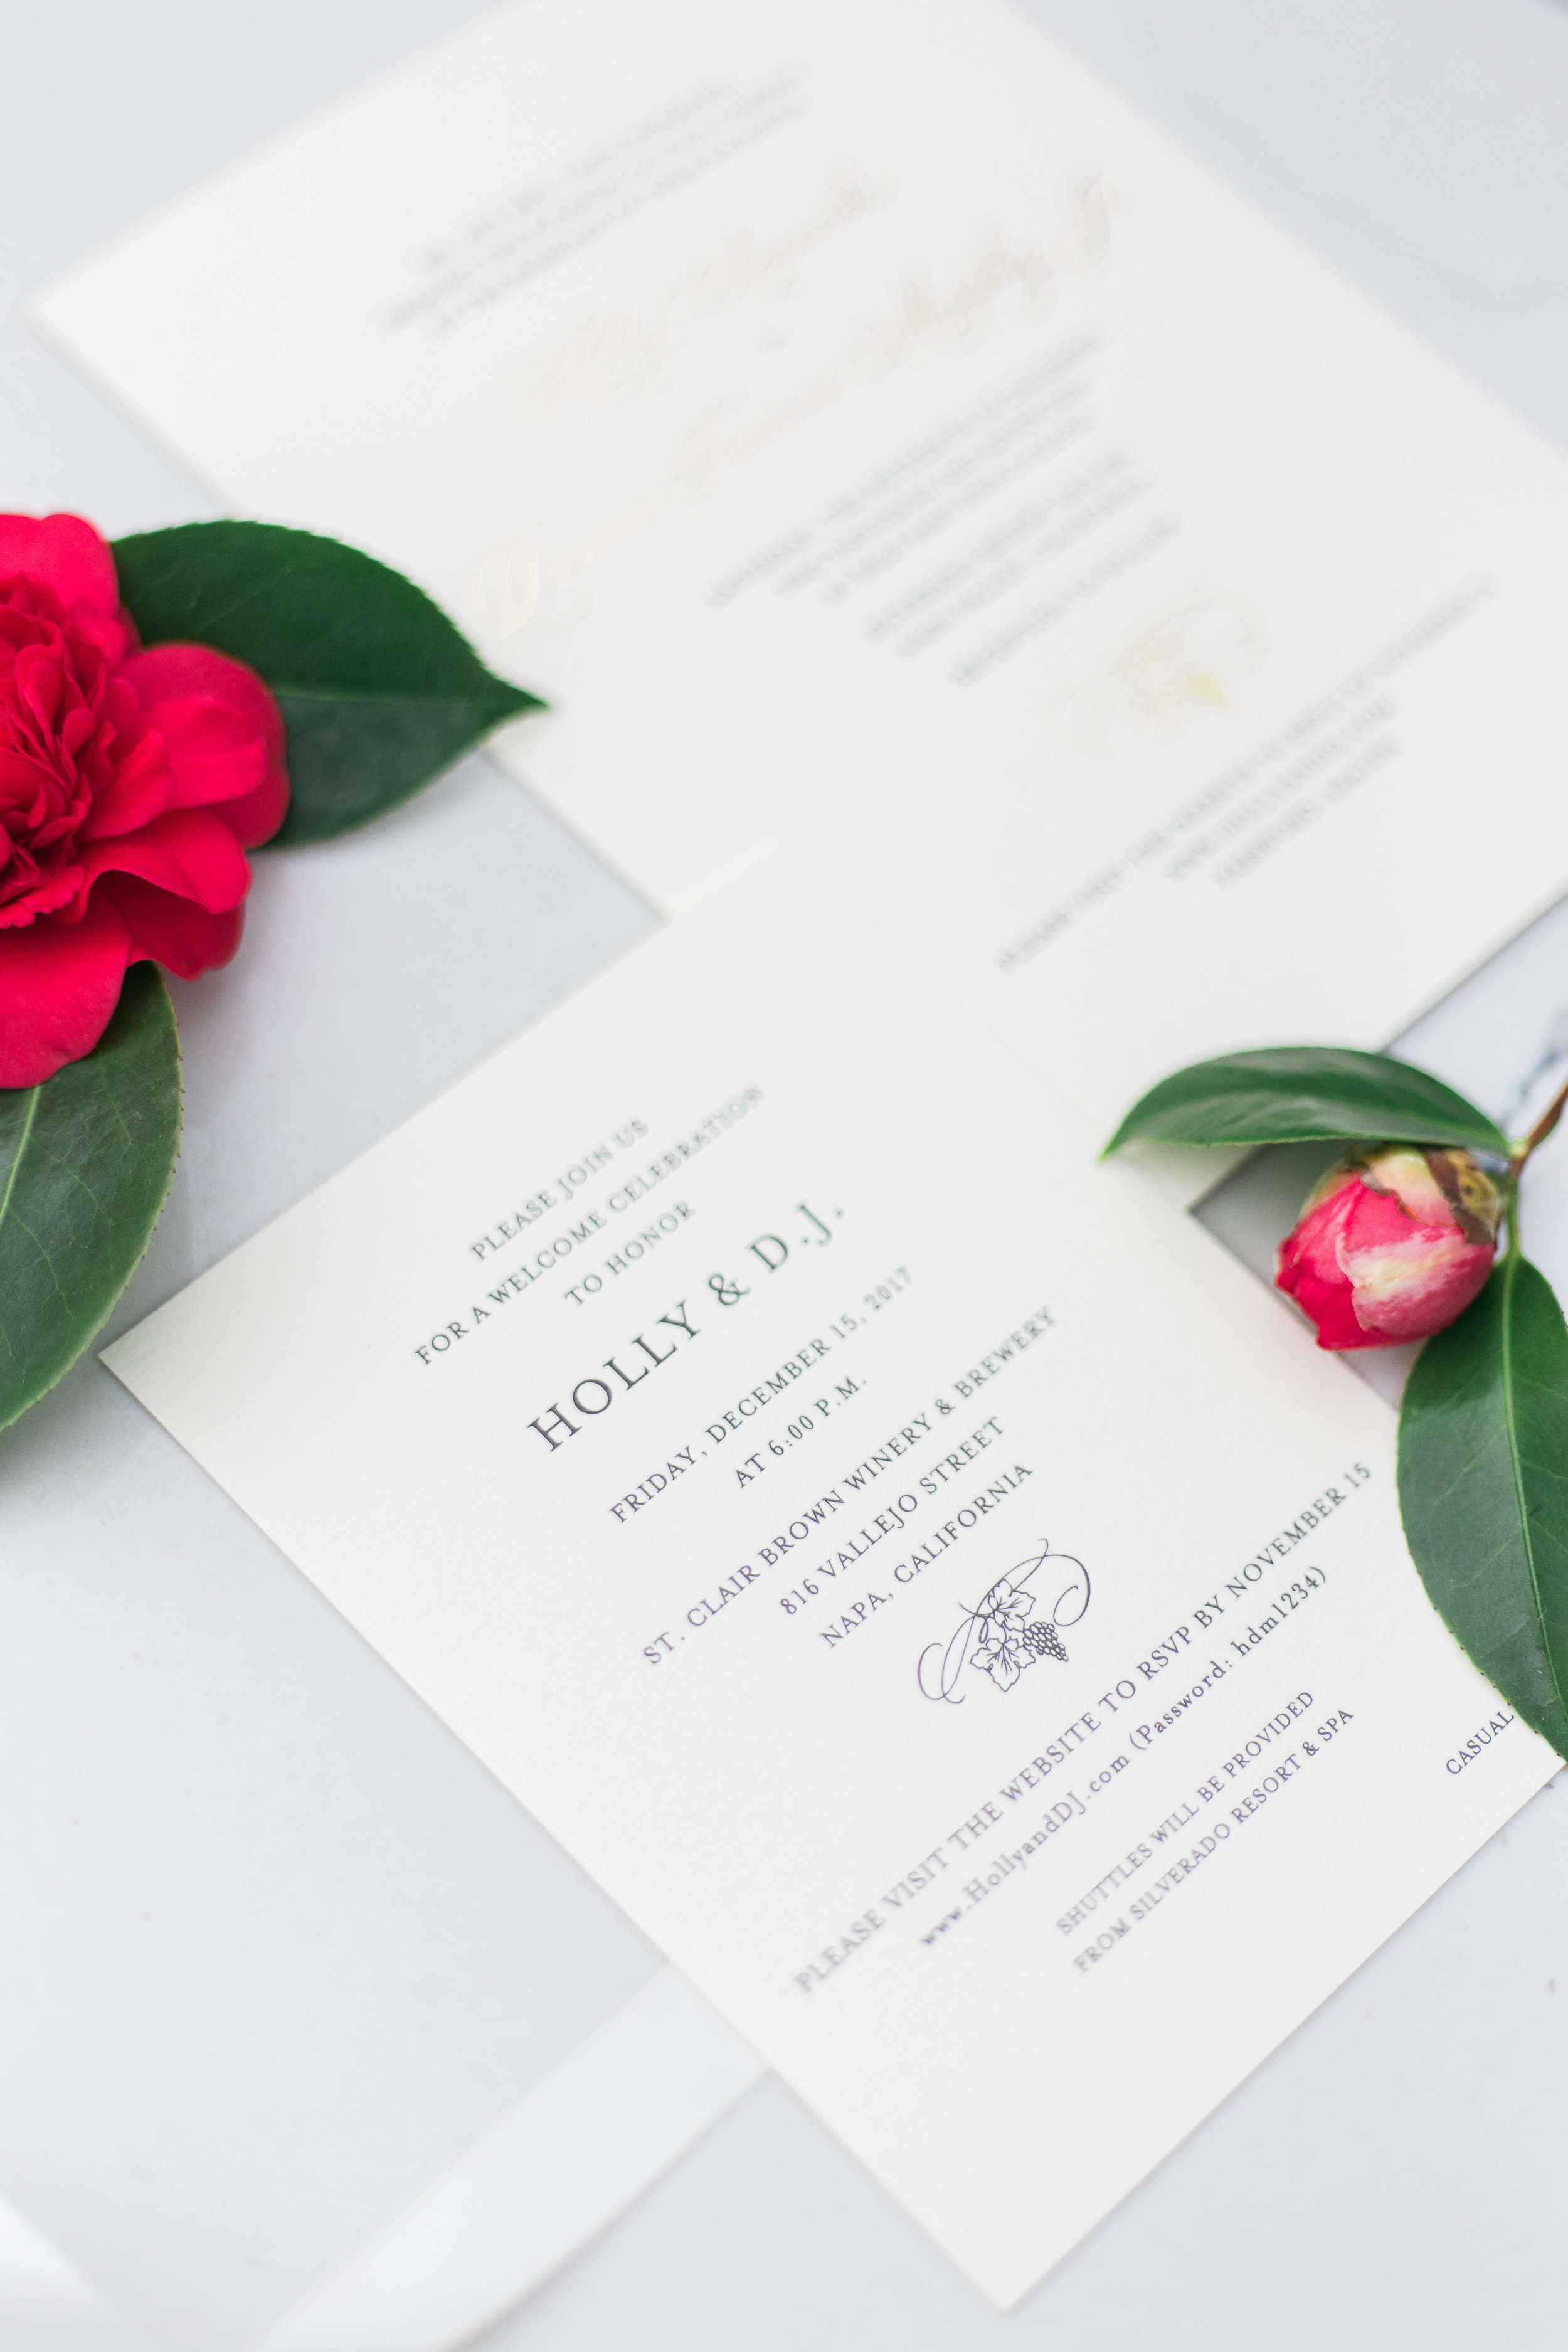 Invitation-Suite-by-JBJ-Pictures-7.jpg